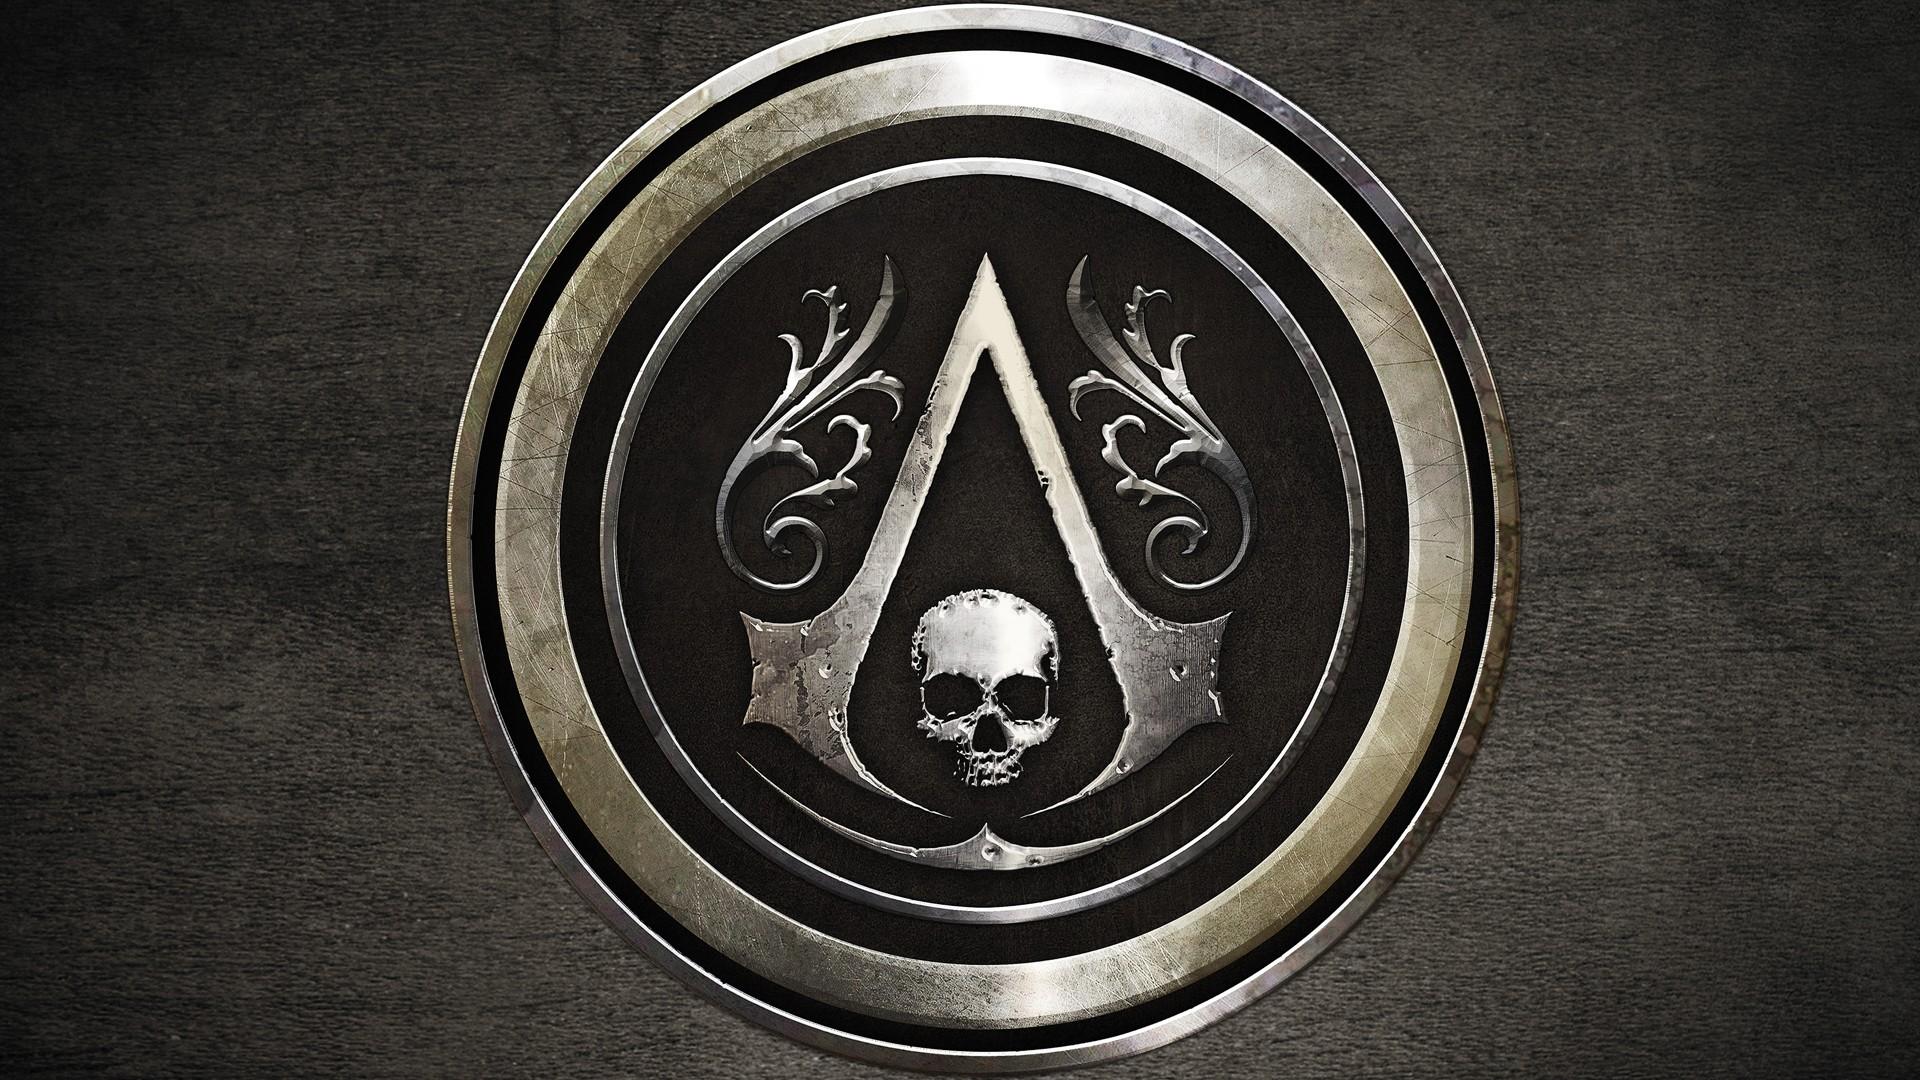 Free Download 47 Assassins Creed Black Flag Logo Hd Wallpaper